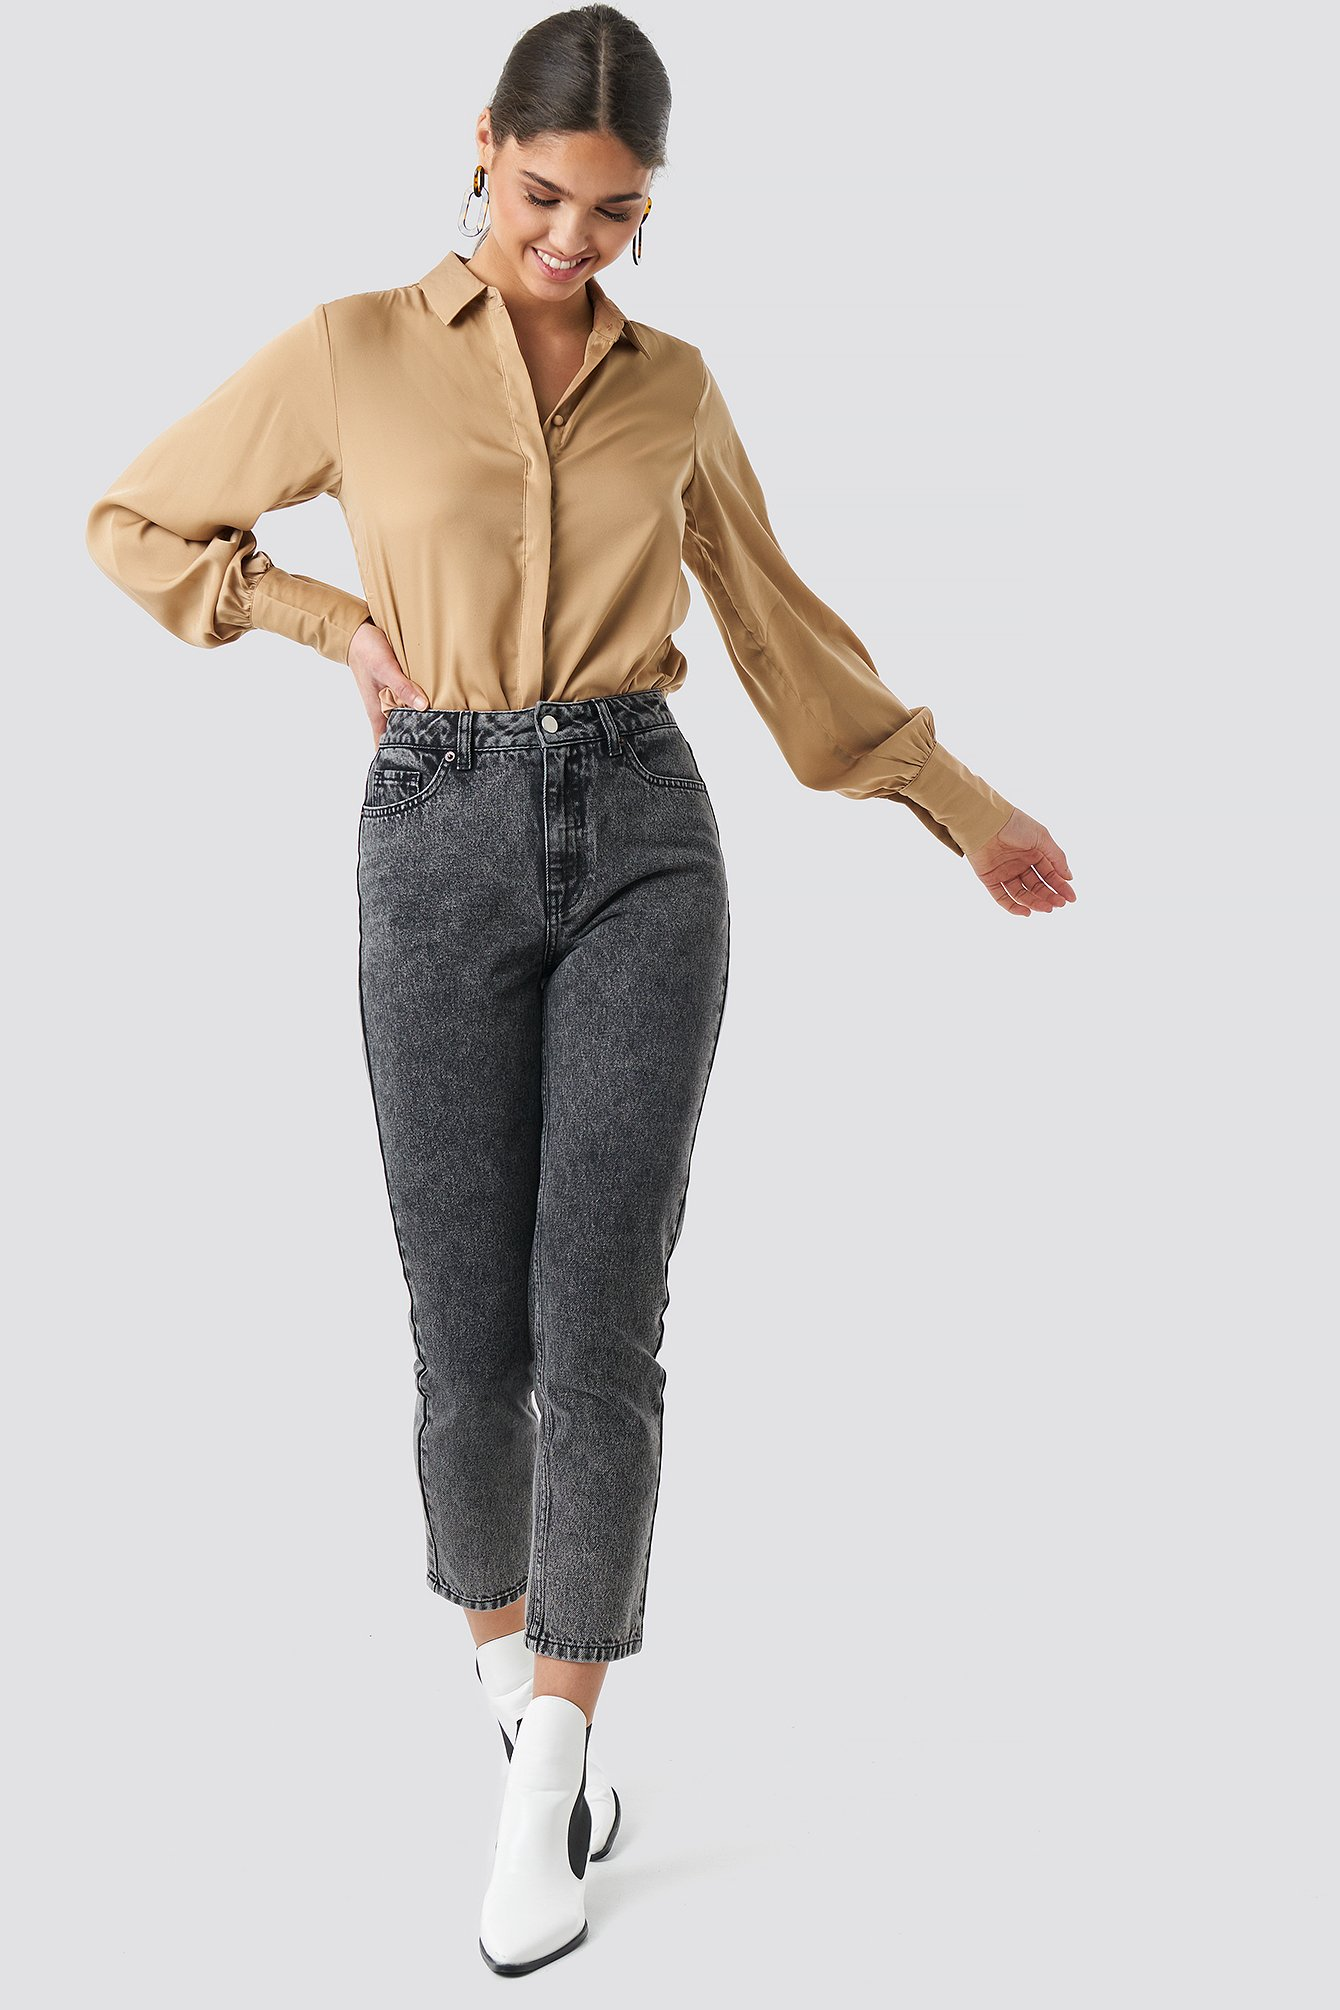 Cropped 5 Pocket Jeans Grå by Na Kd Trend